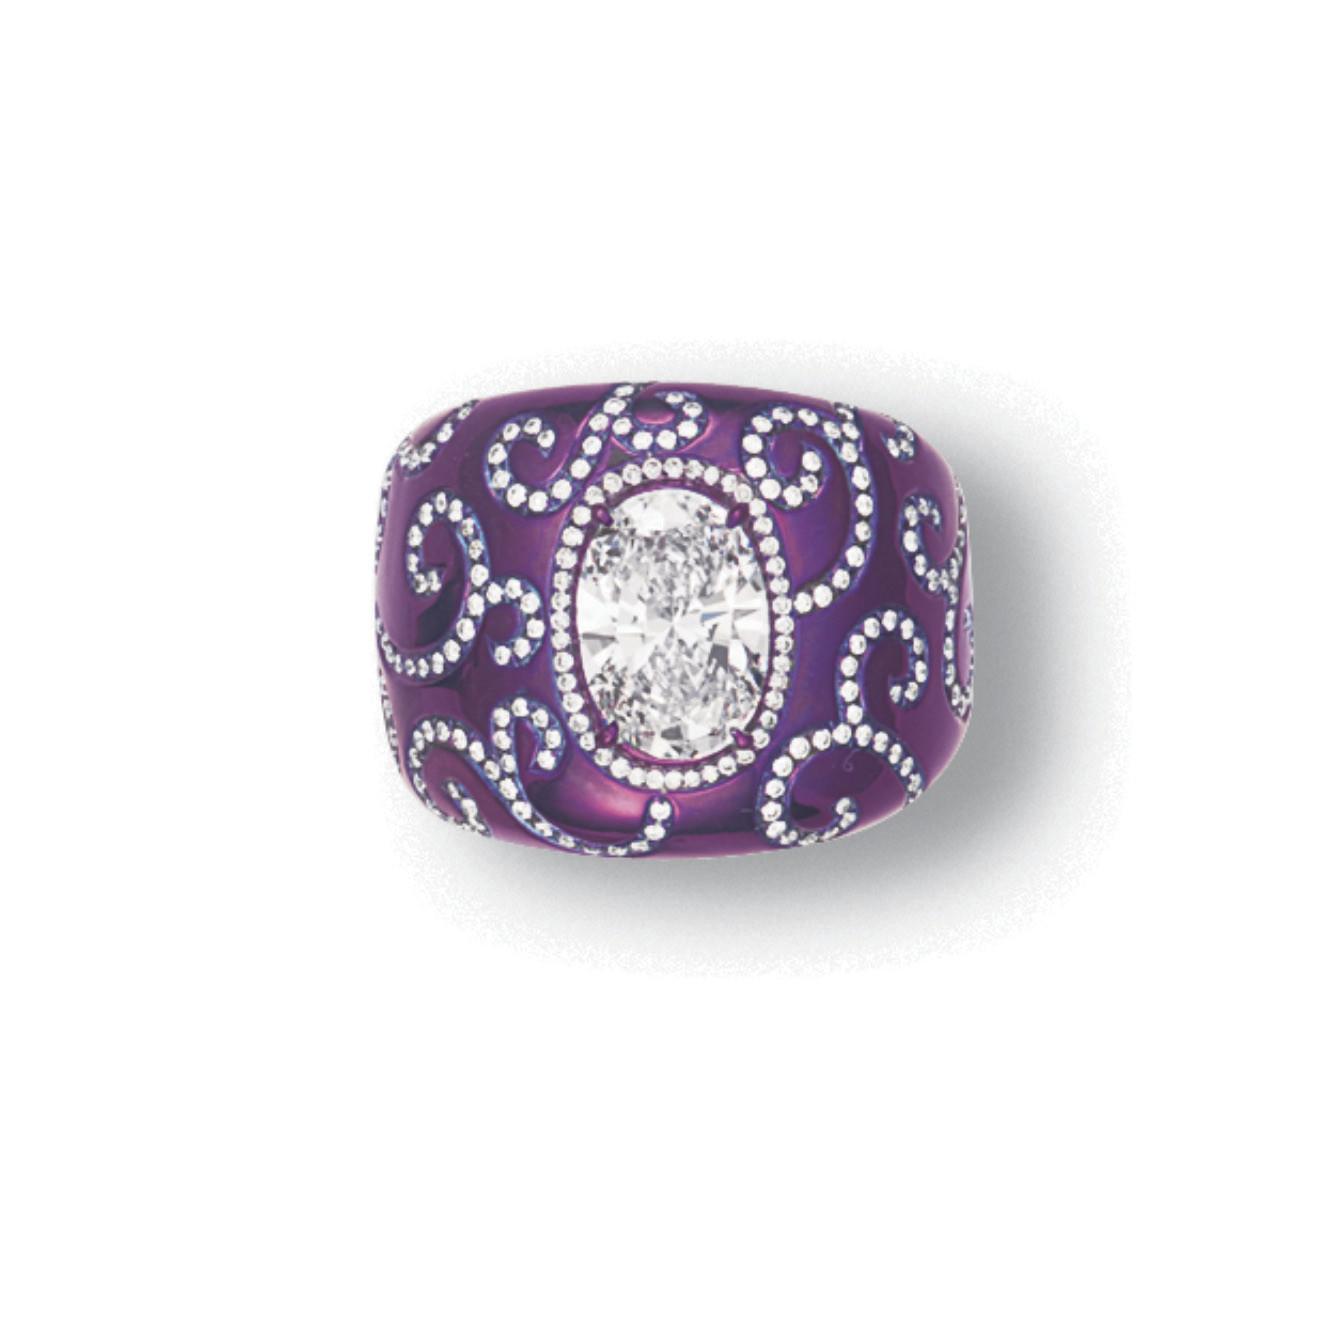 A DIAMOND RING, BY J. KOO